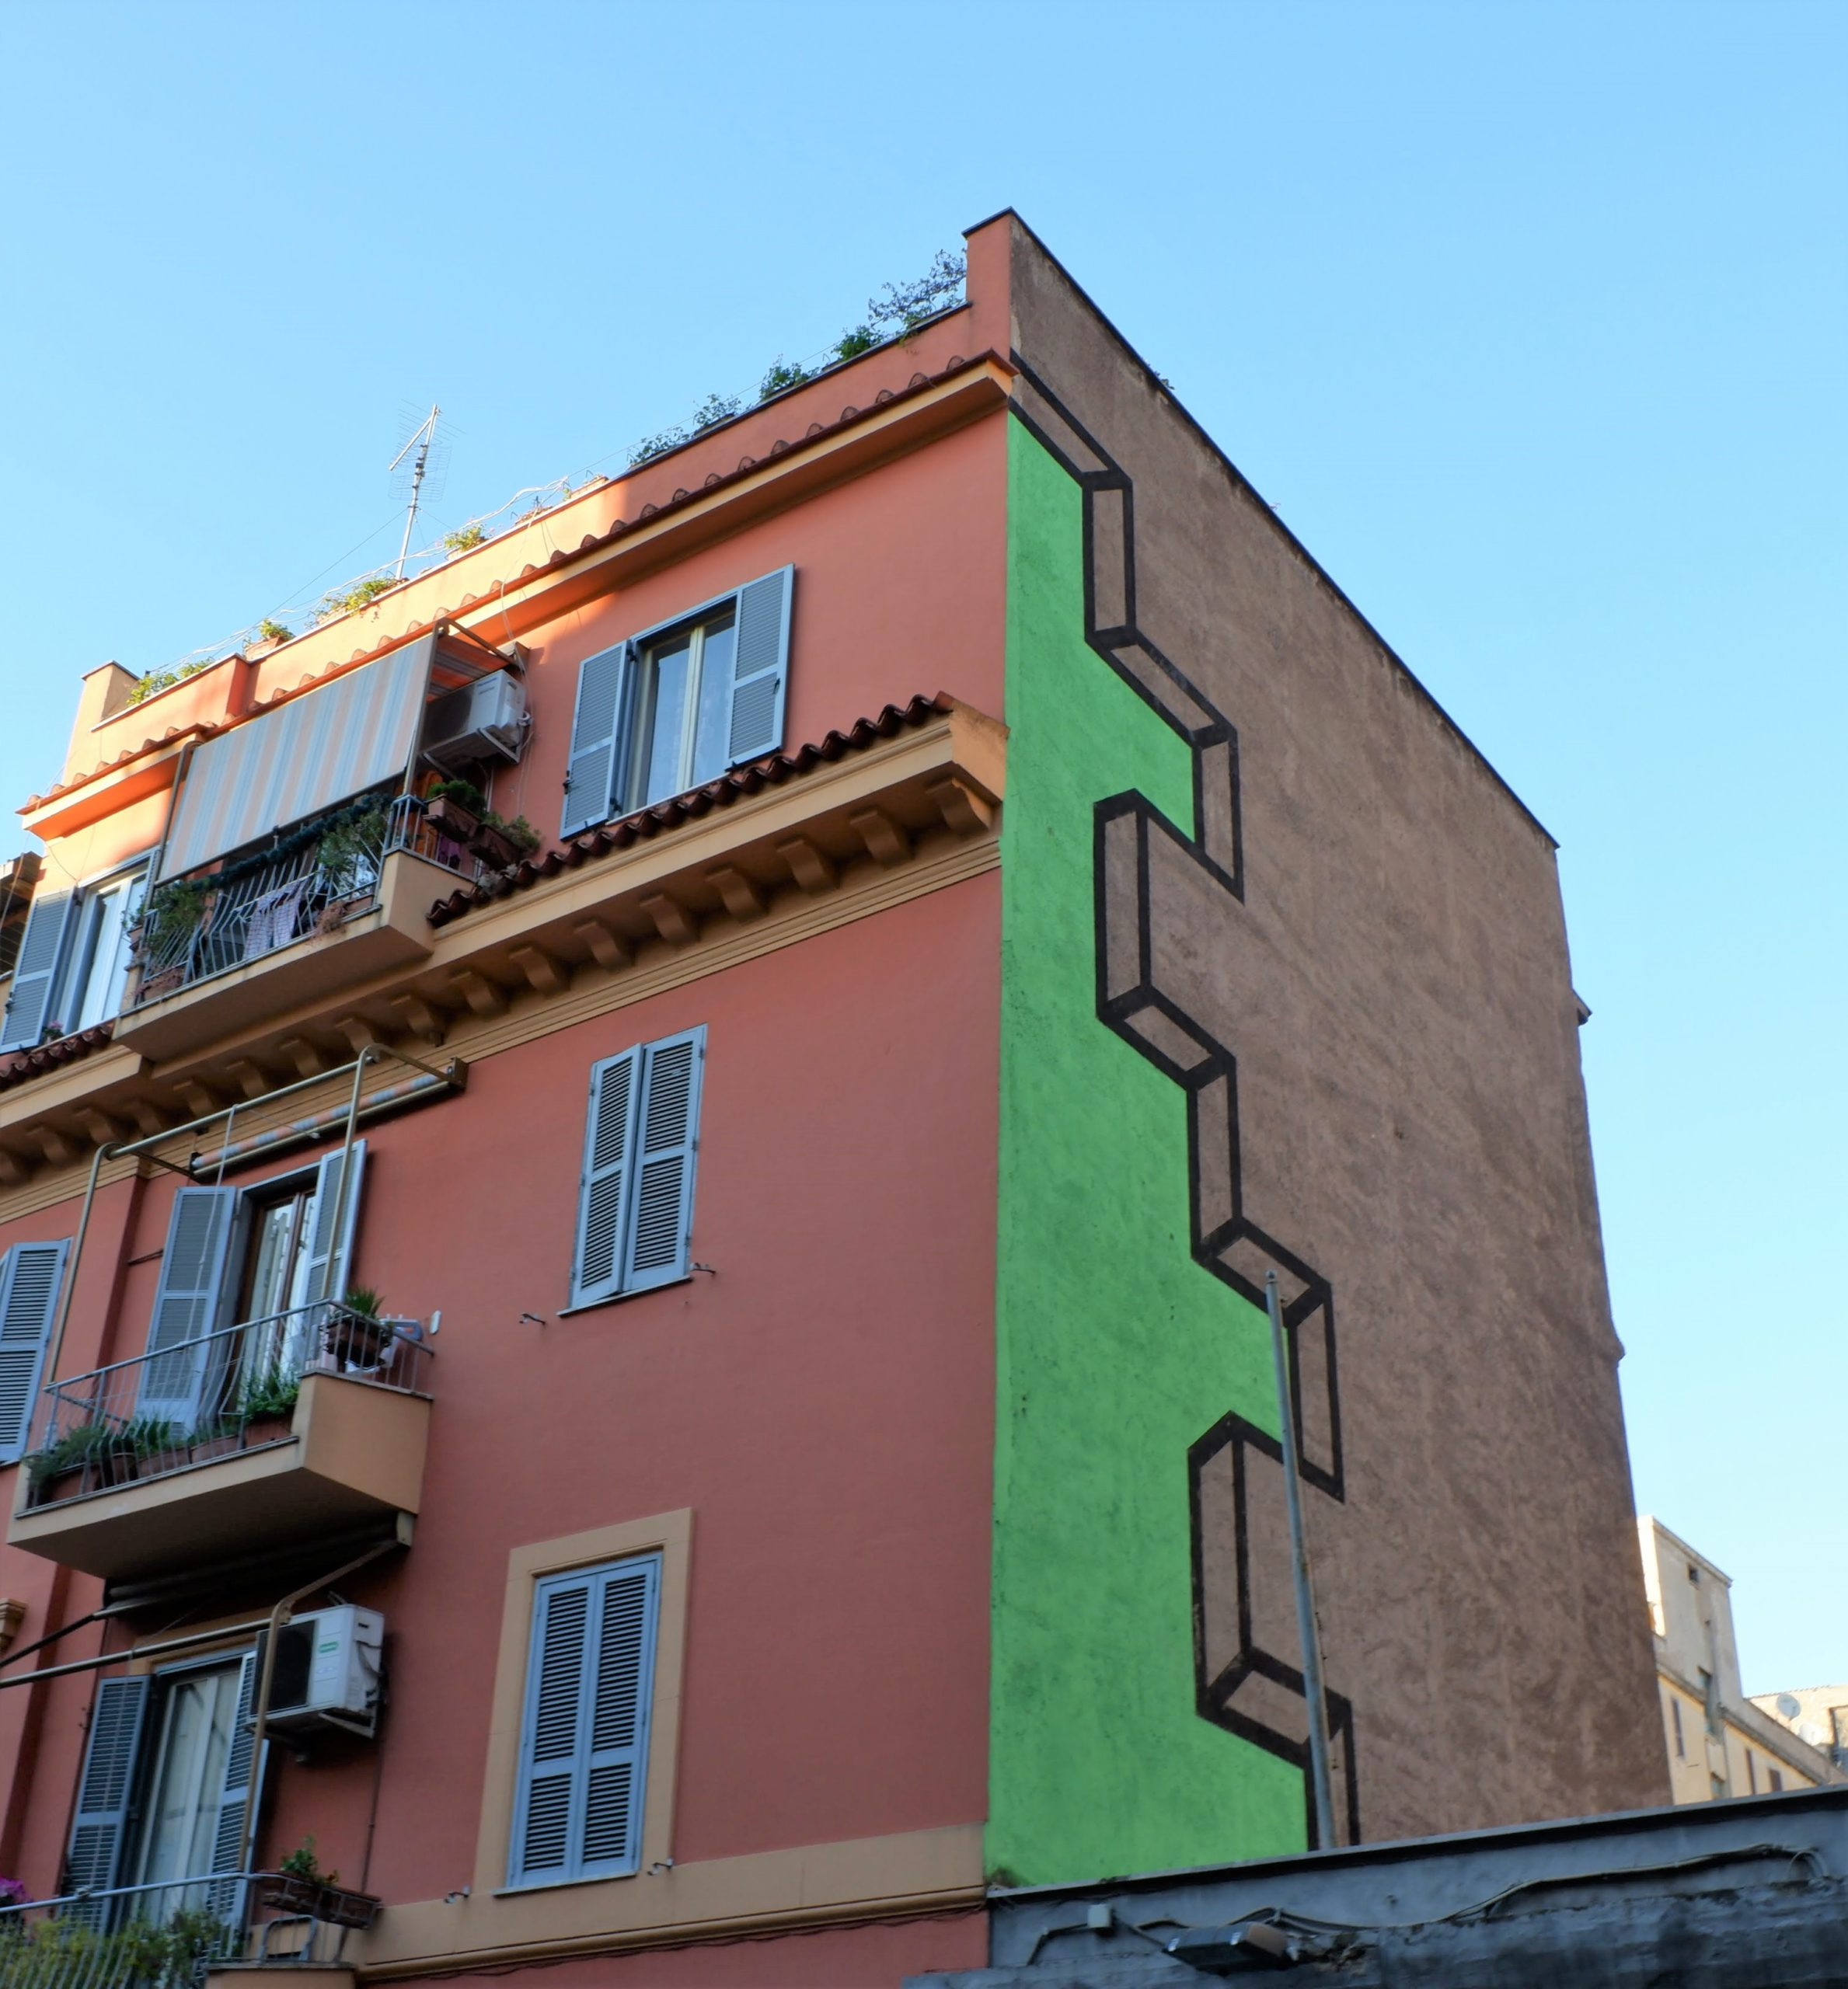 nihalami tor pignattara street art roma